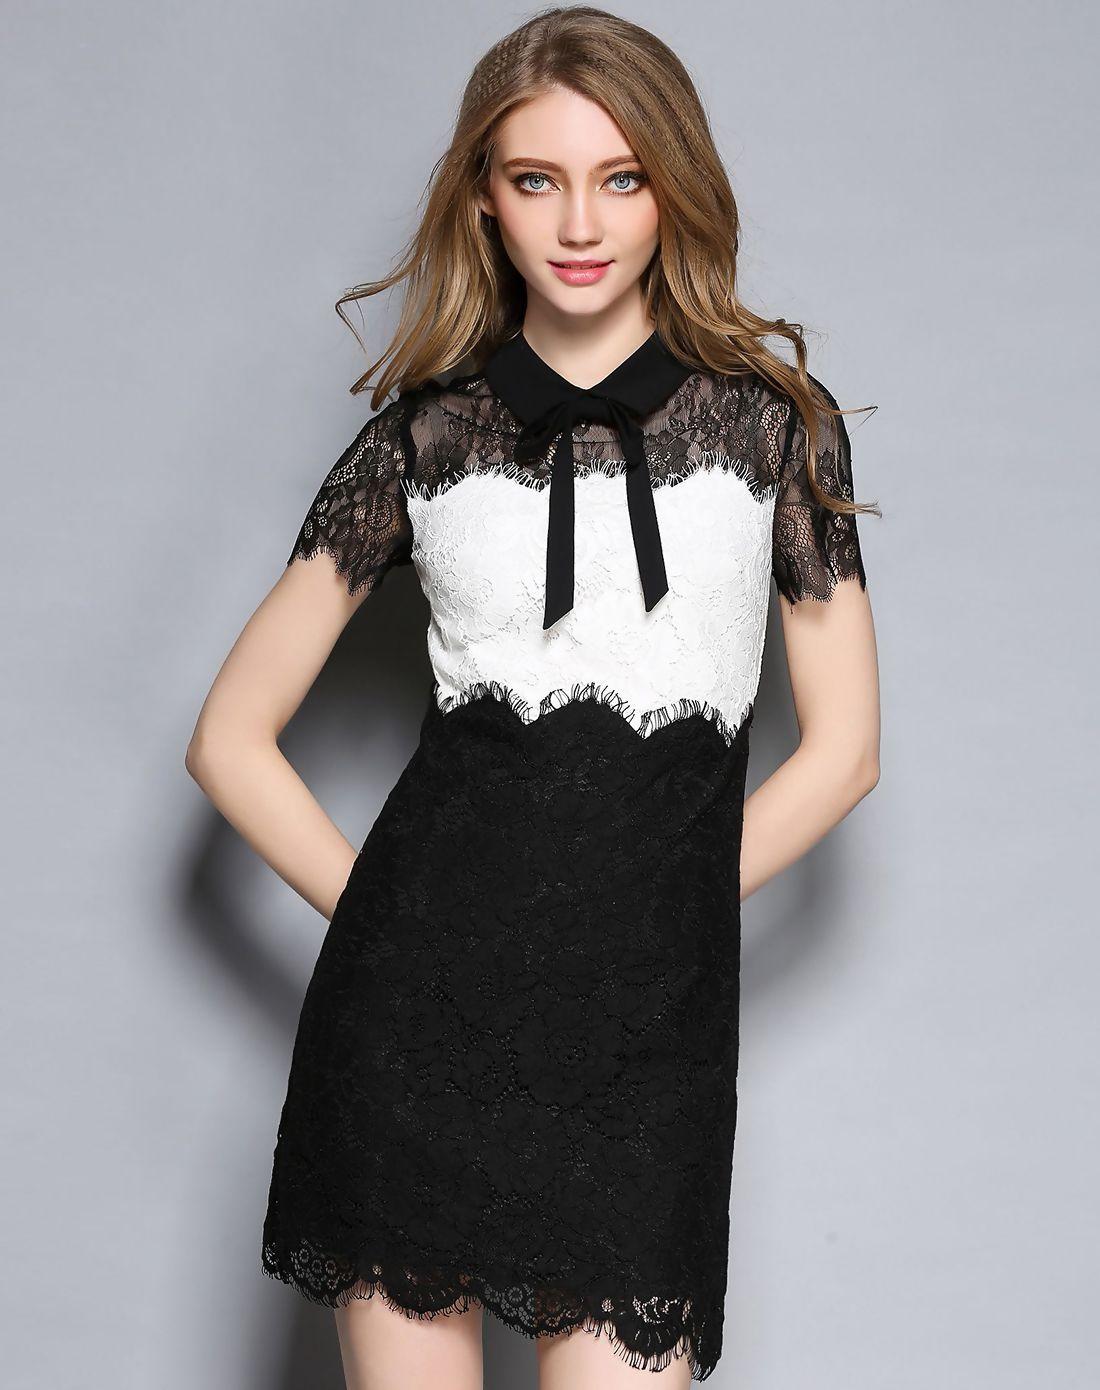 #AdoreWe #VIPme Sheath Dresses❤️Designer Jescakoo Black & White Lace Bow Collar Paneled Sheath Mini Dress - AdoreWe.com